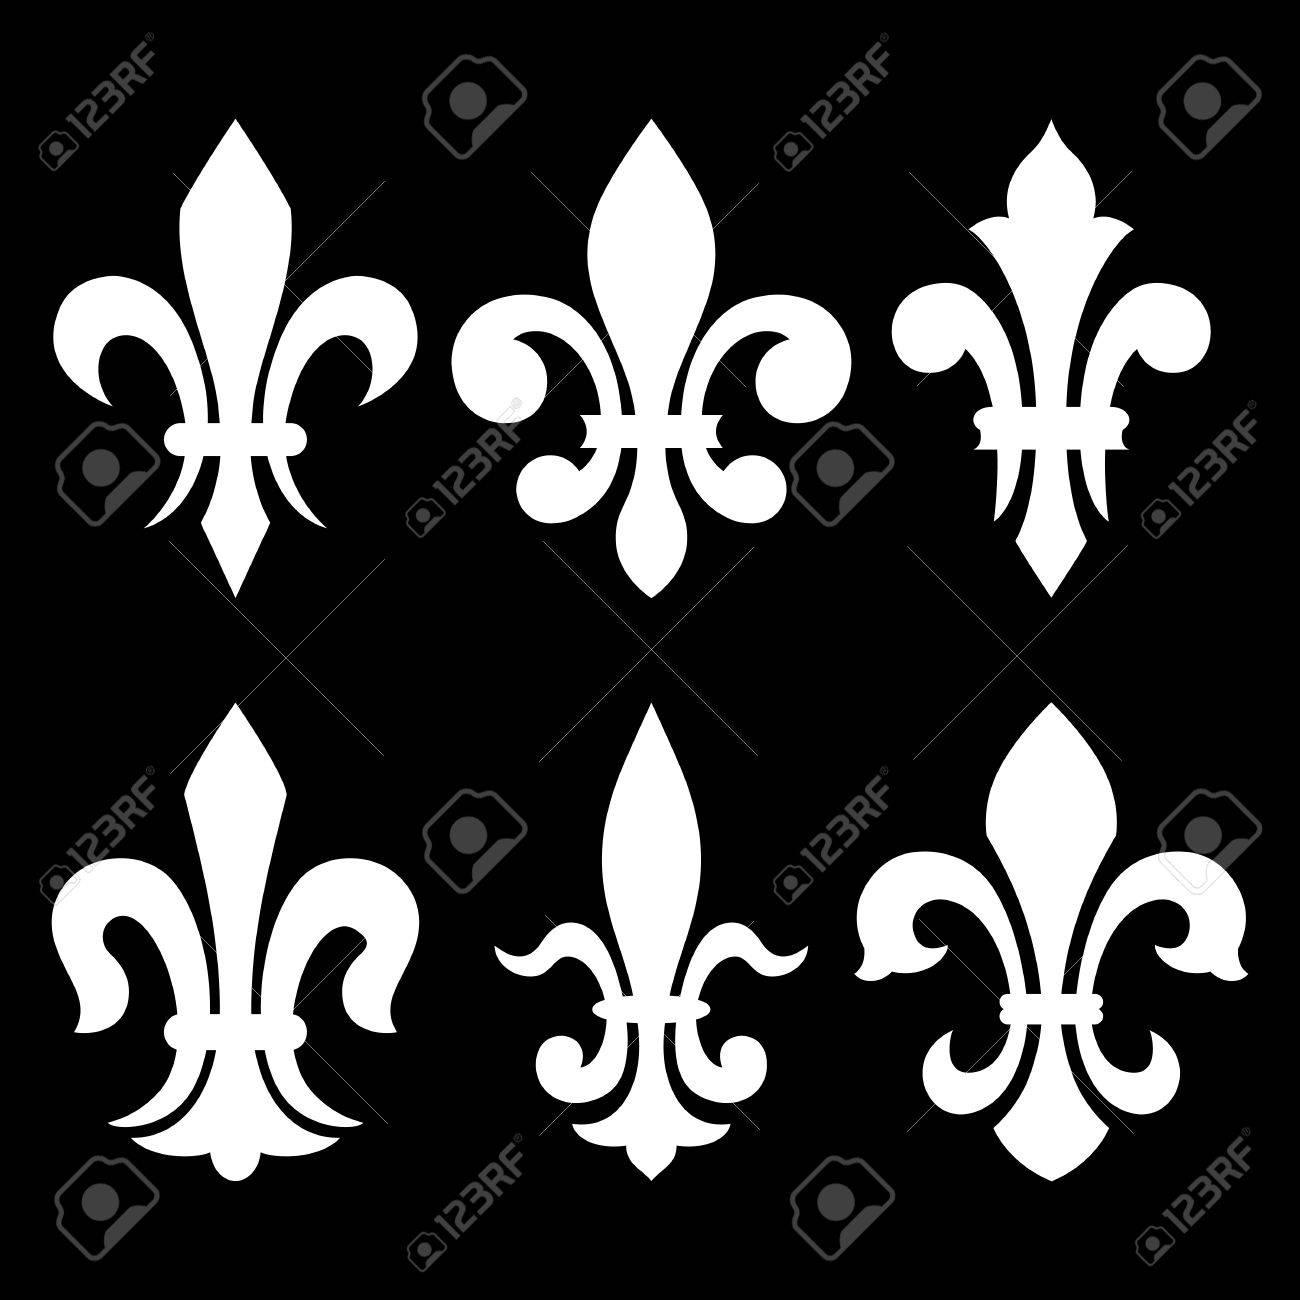 Flower meanings lily - Lily Flower Heraldic Symbol Fleur De Lis Vector Image Stock Vector